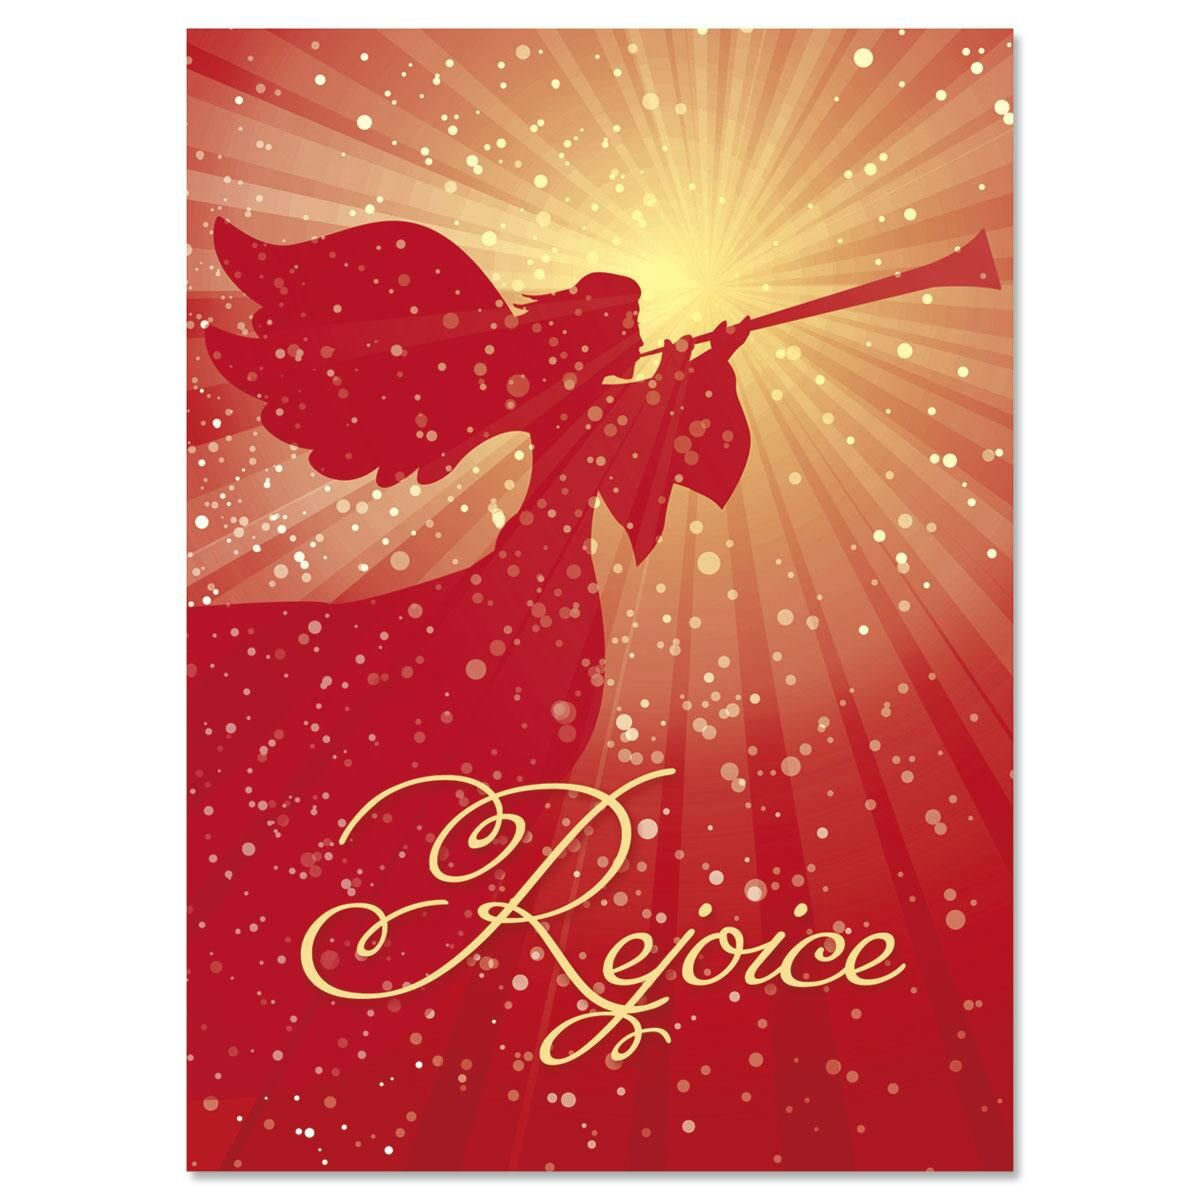 Rejoice Christmas Cards | Current Catalog